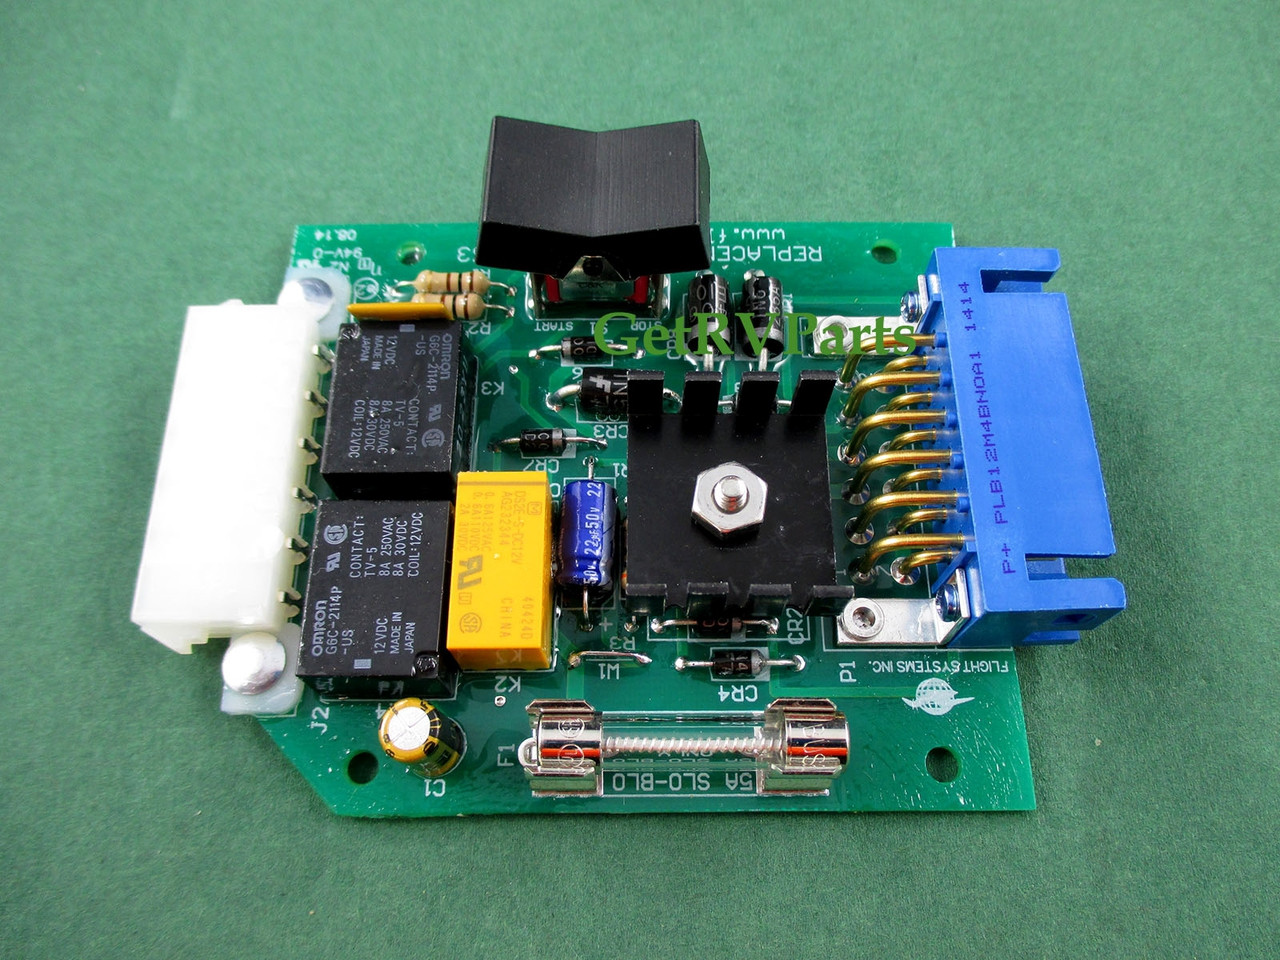 onan aftermarket 300 3763 01 generator circuit board by flight systems rh getrvparts com onan generator manual onan generator troubleshooting [ 1280 x 960 Pixel ]